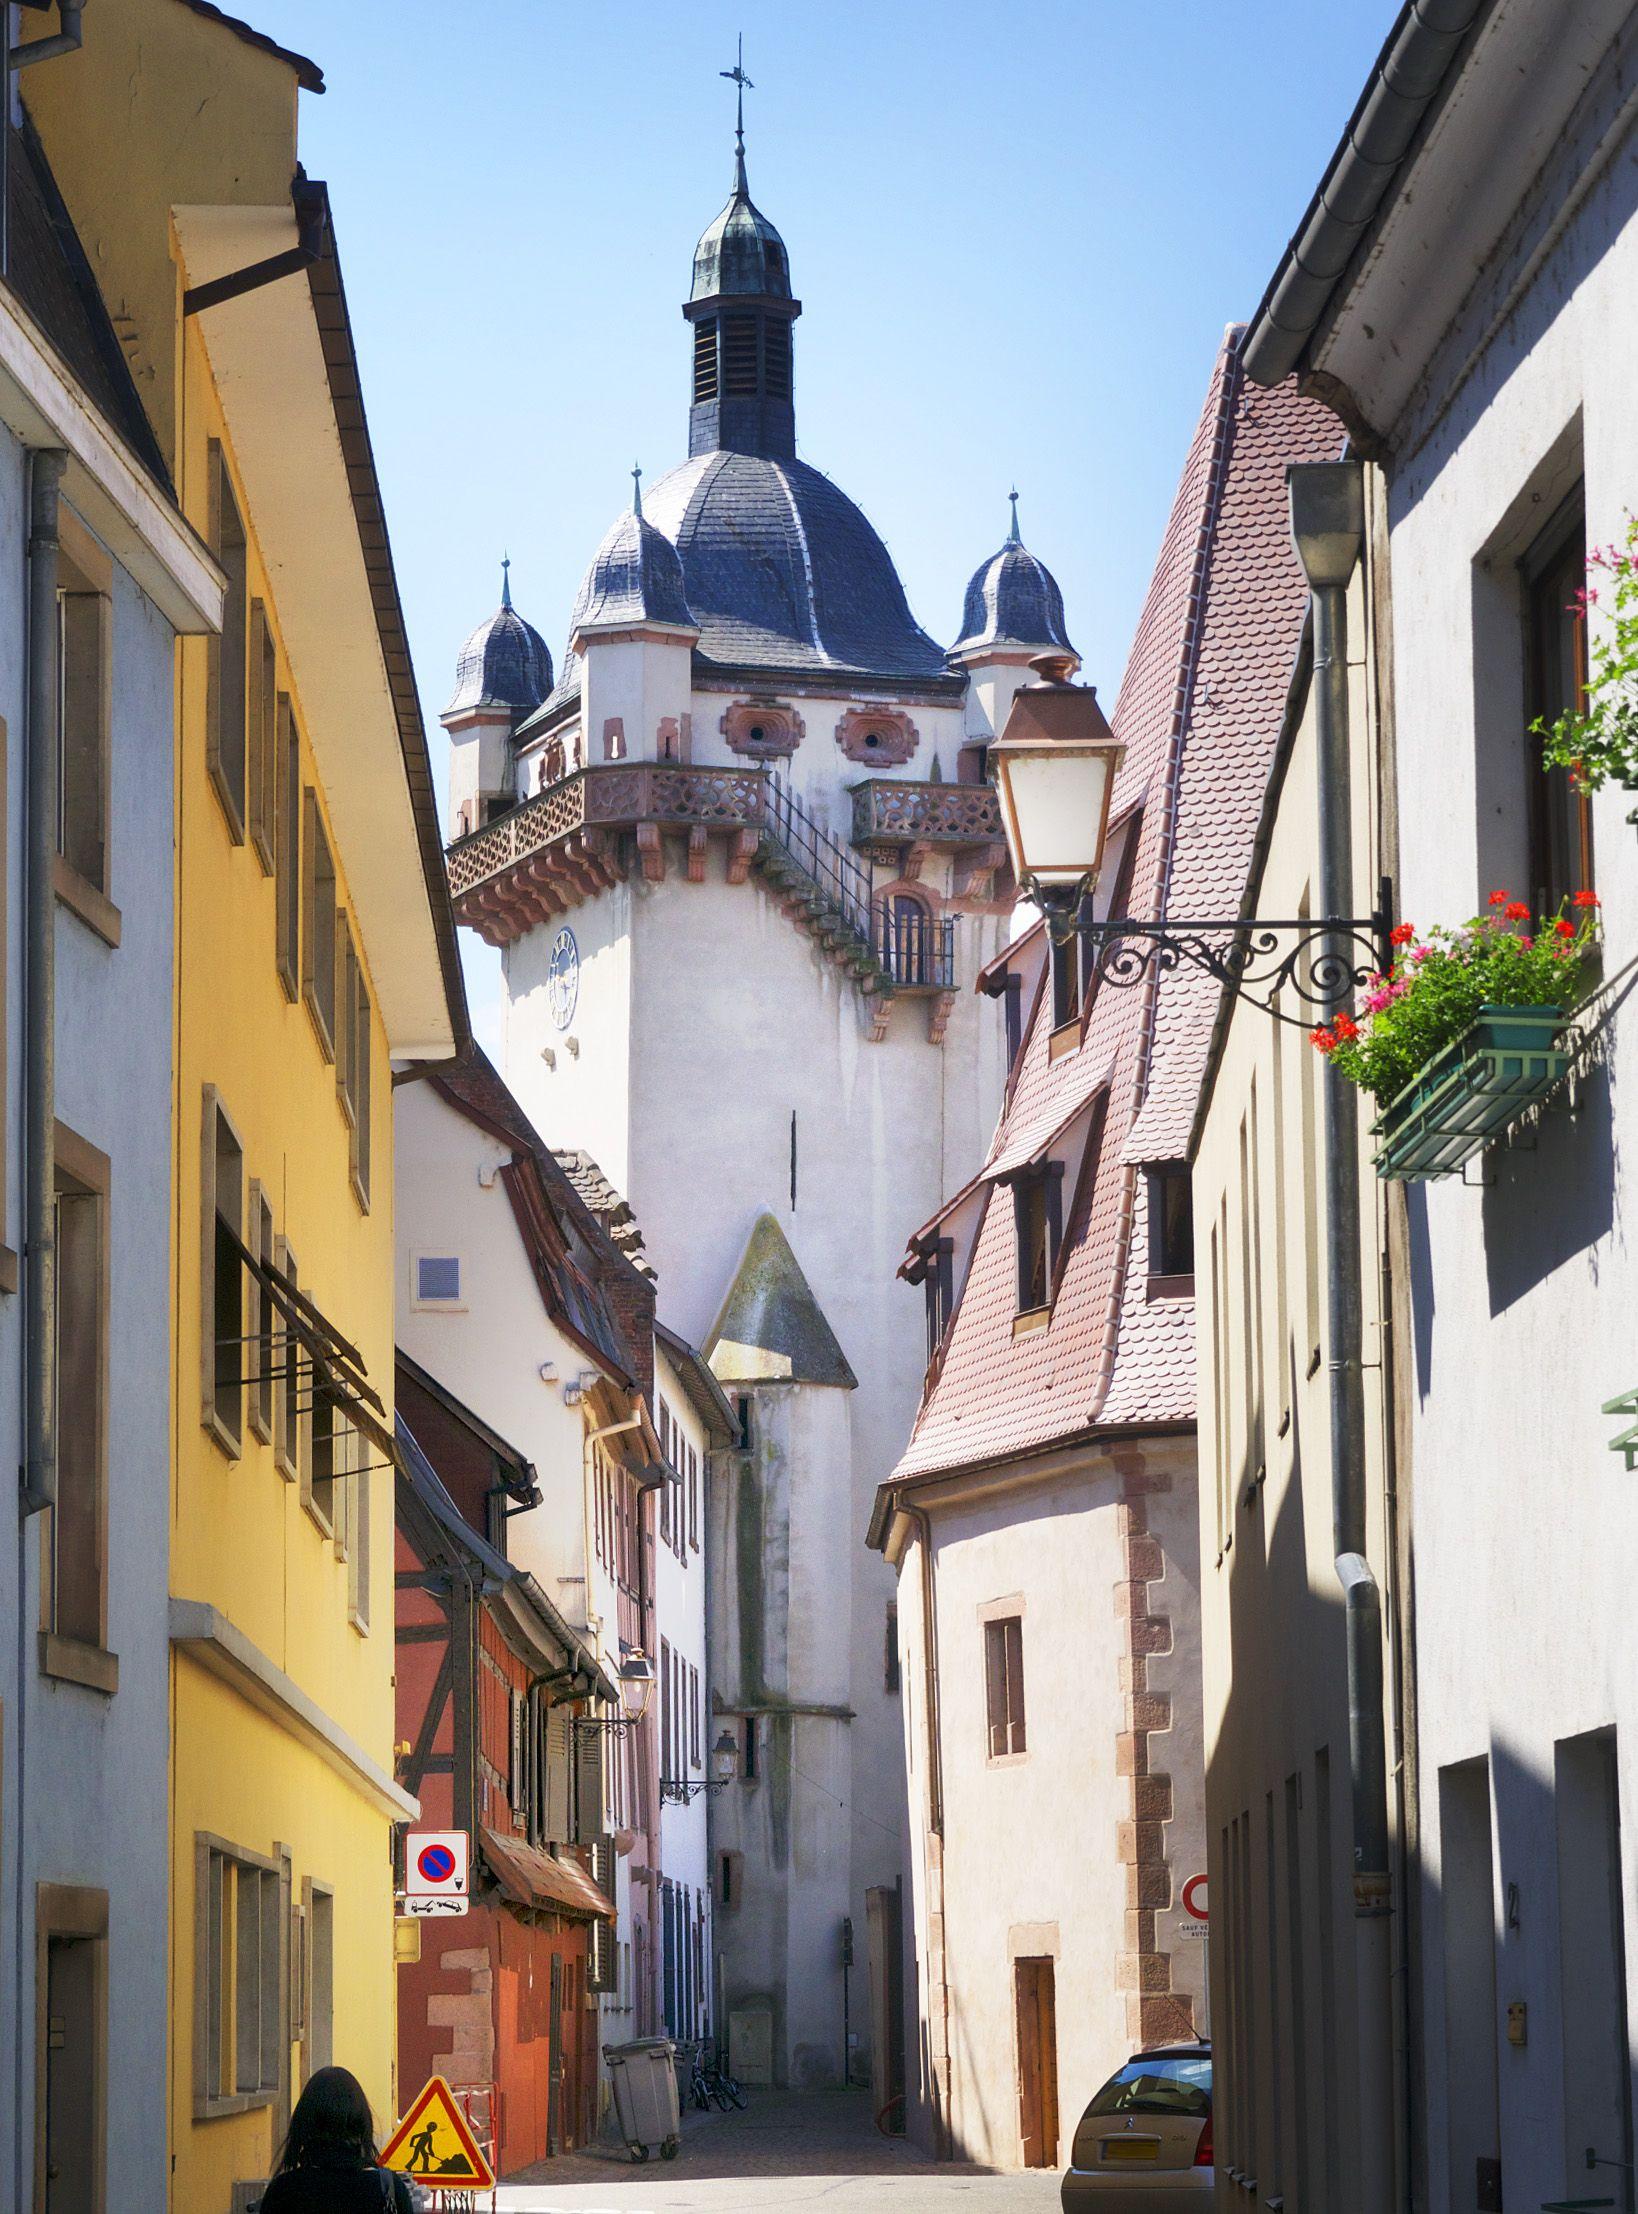 """Neuer Turm"" in Selestat, Alsace, früher Schlettstadt"